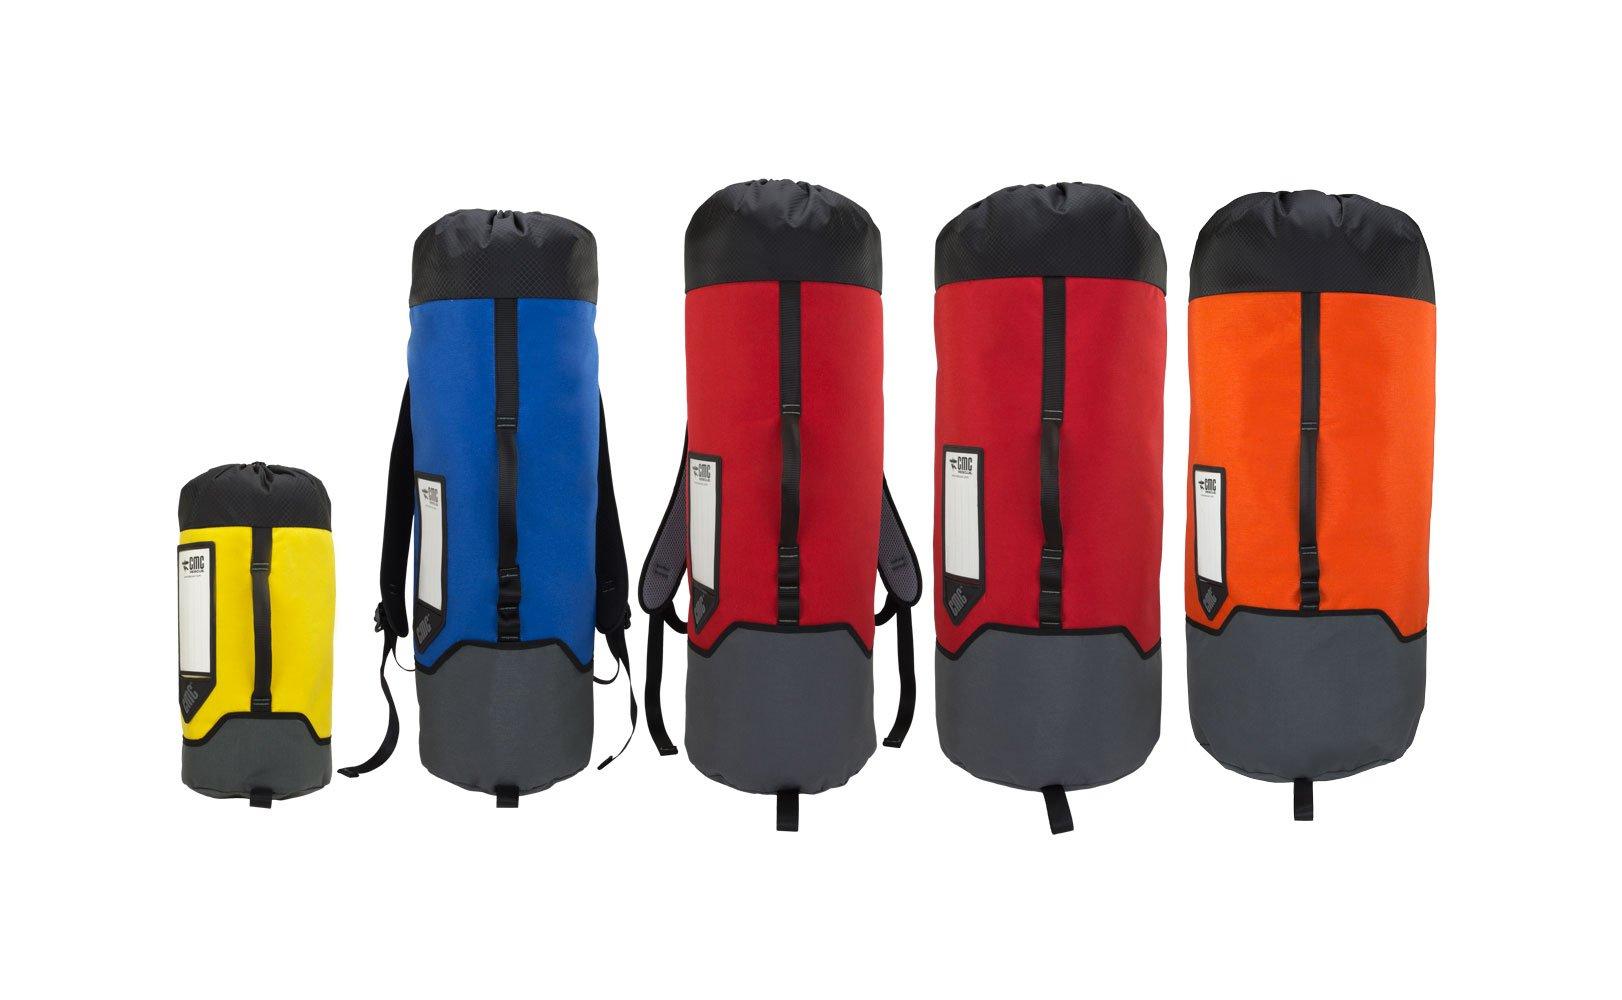 CMC Rescue 430103 Rope Bags Model #1 - 700 ci (11 L) Red